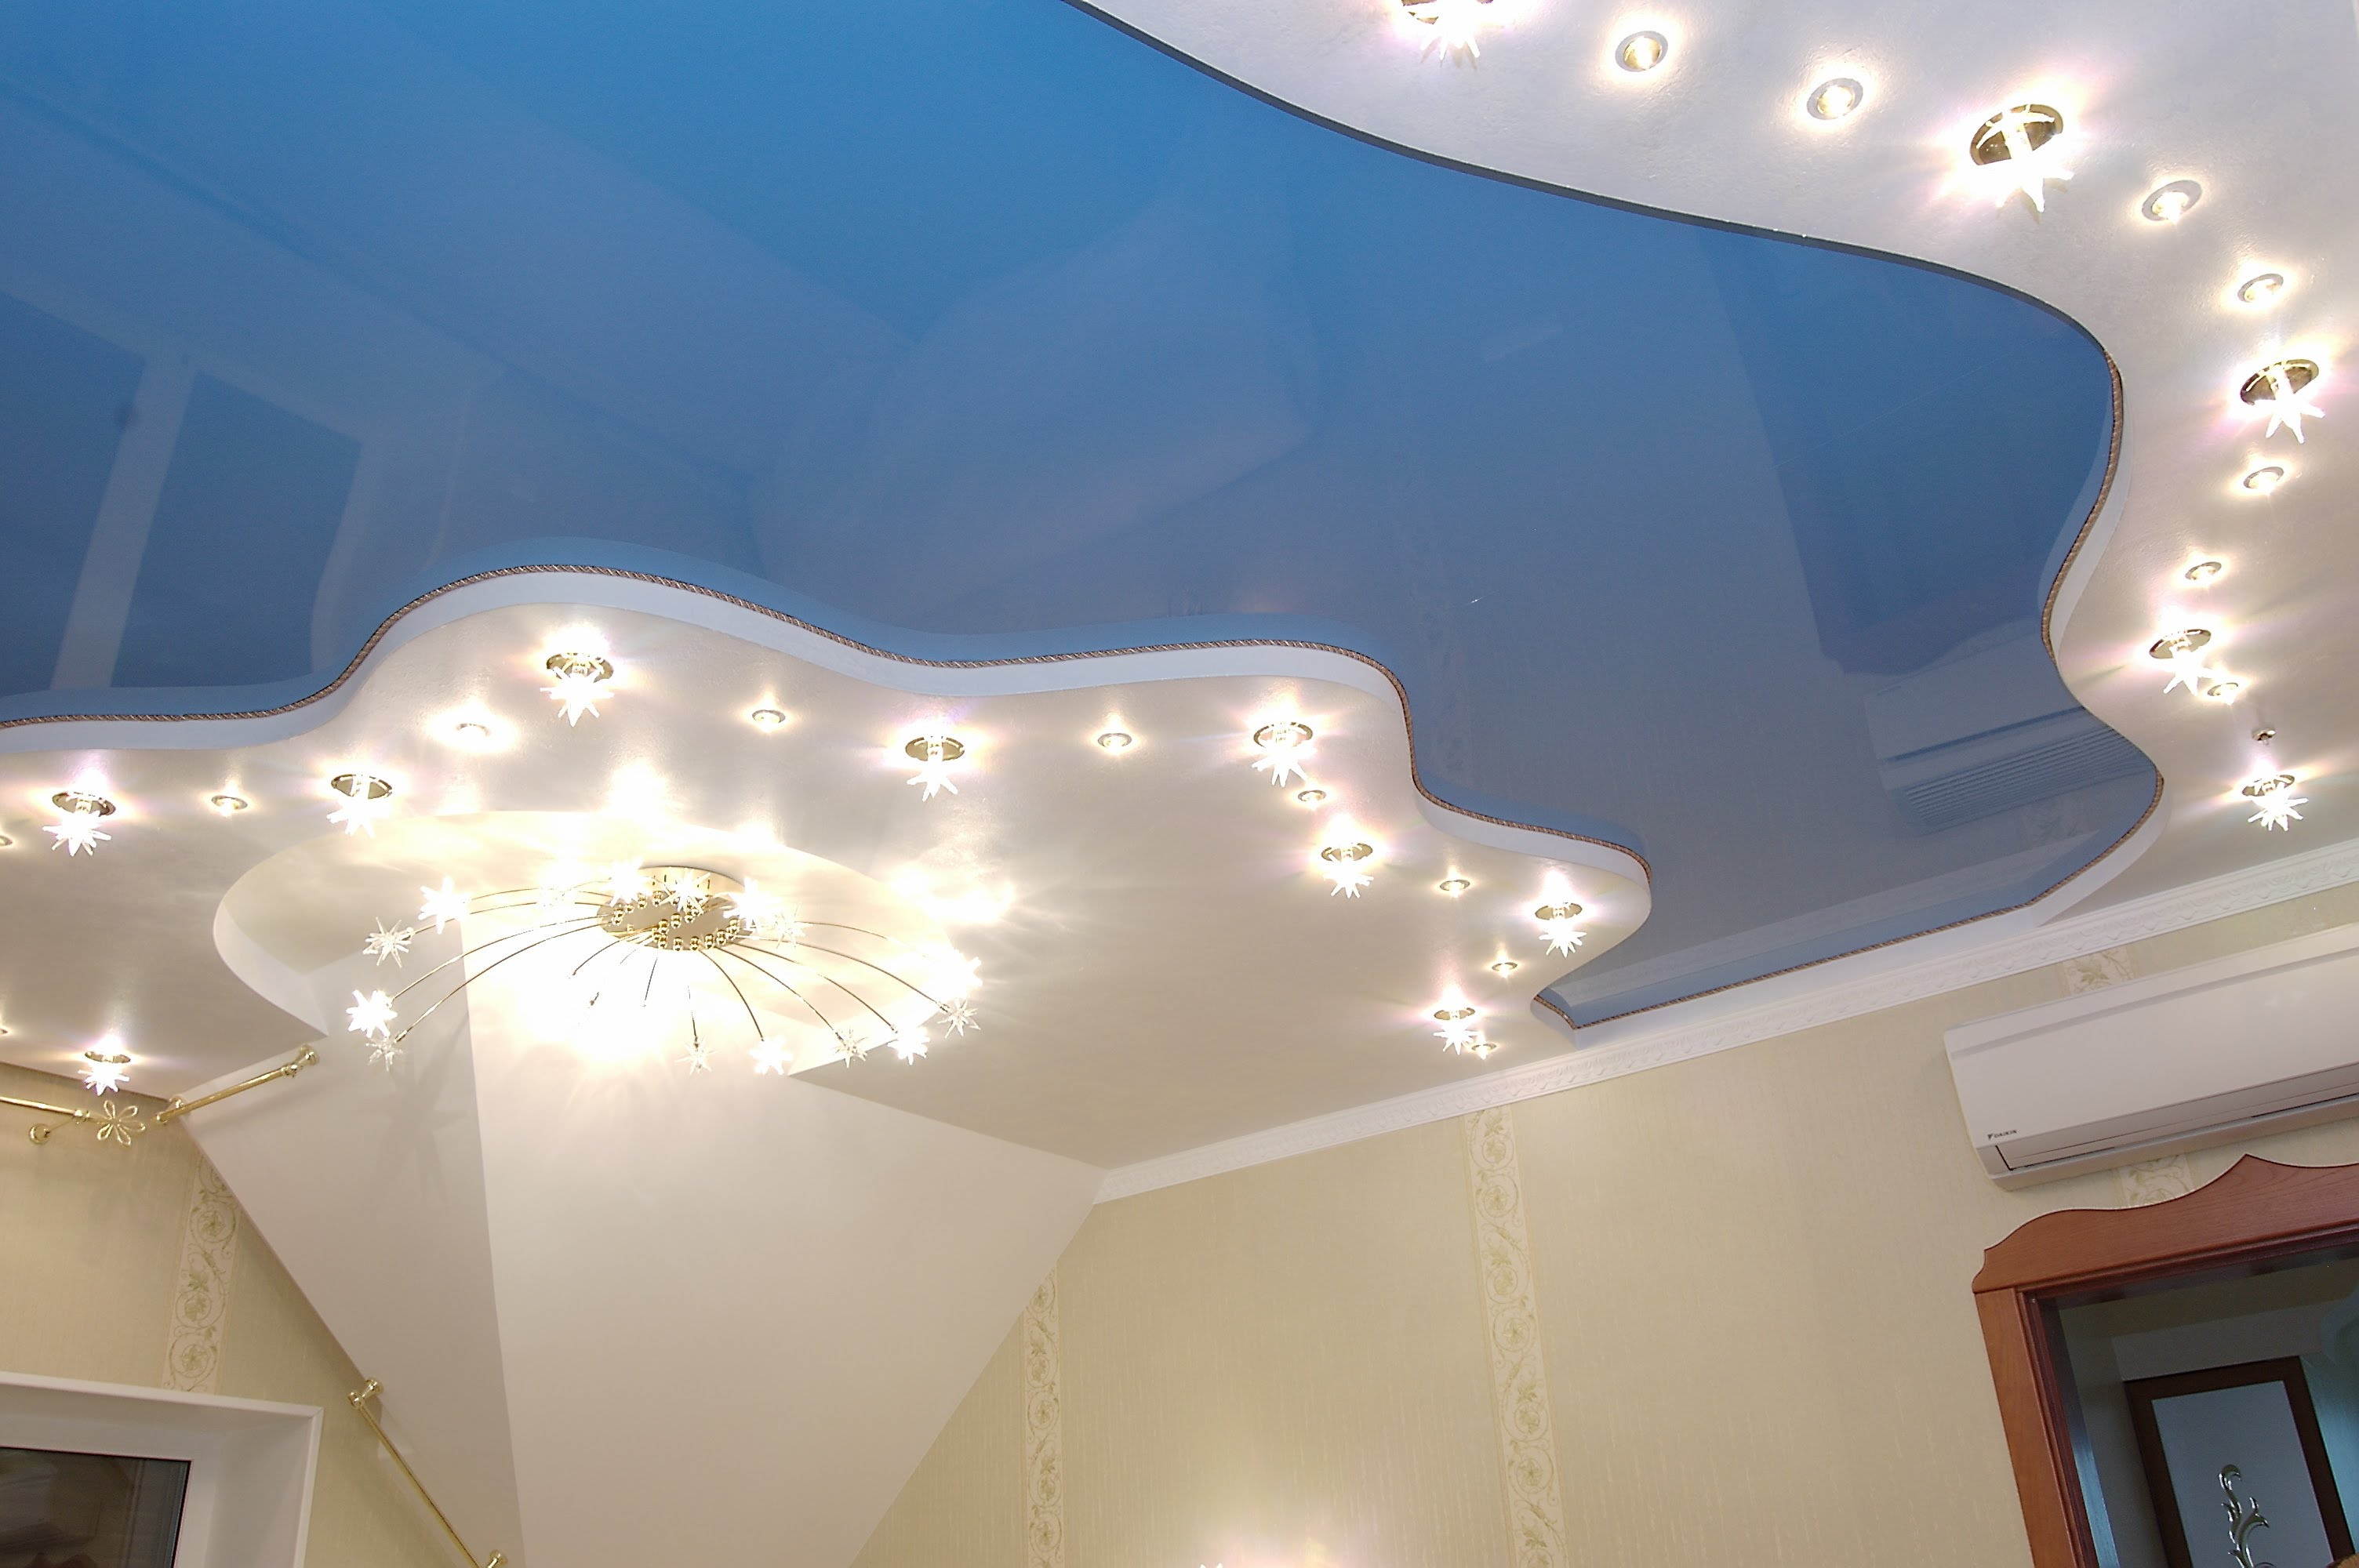 Идеи для ремонта потолка фото